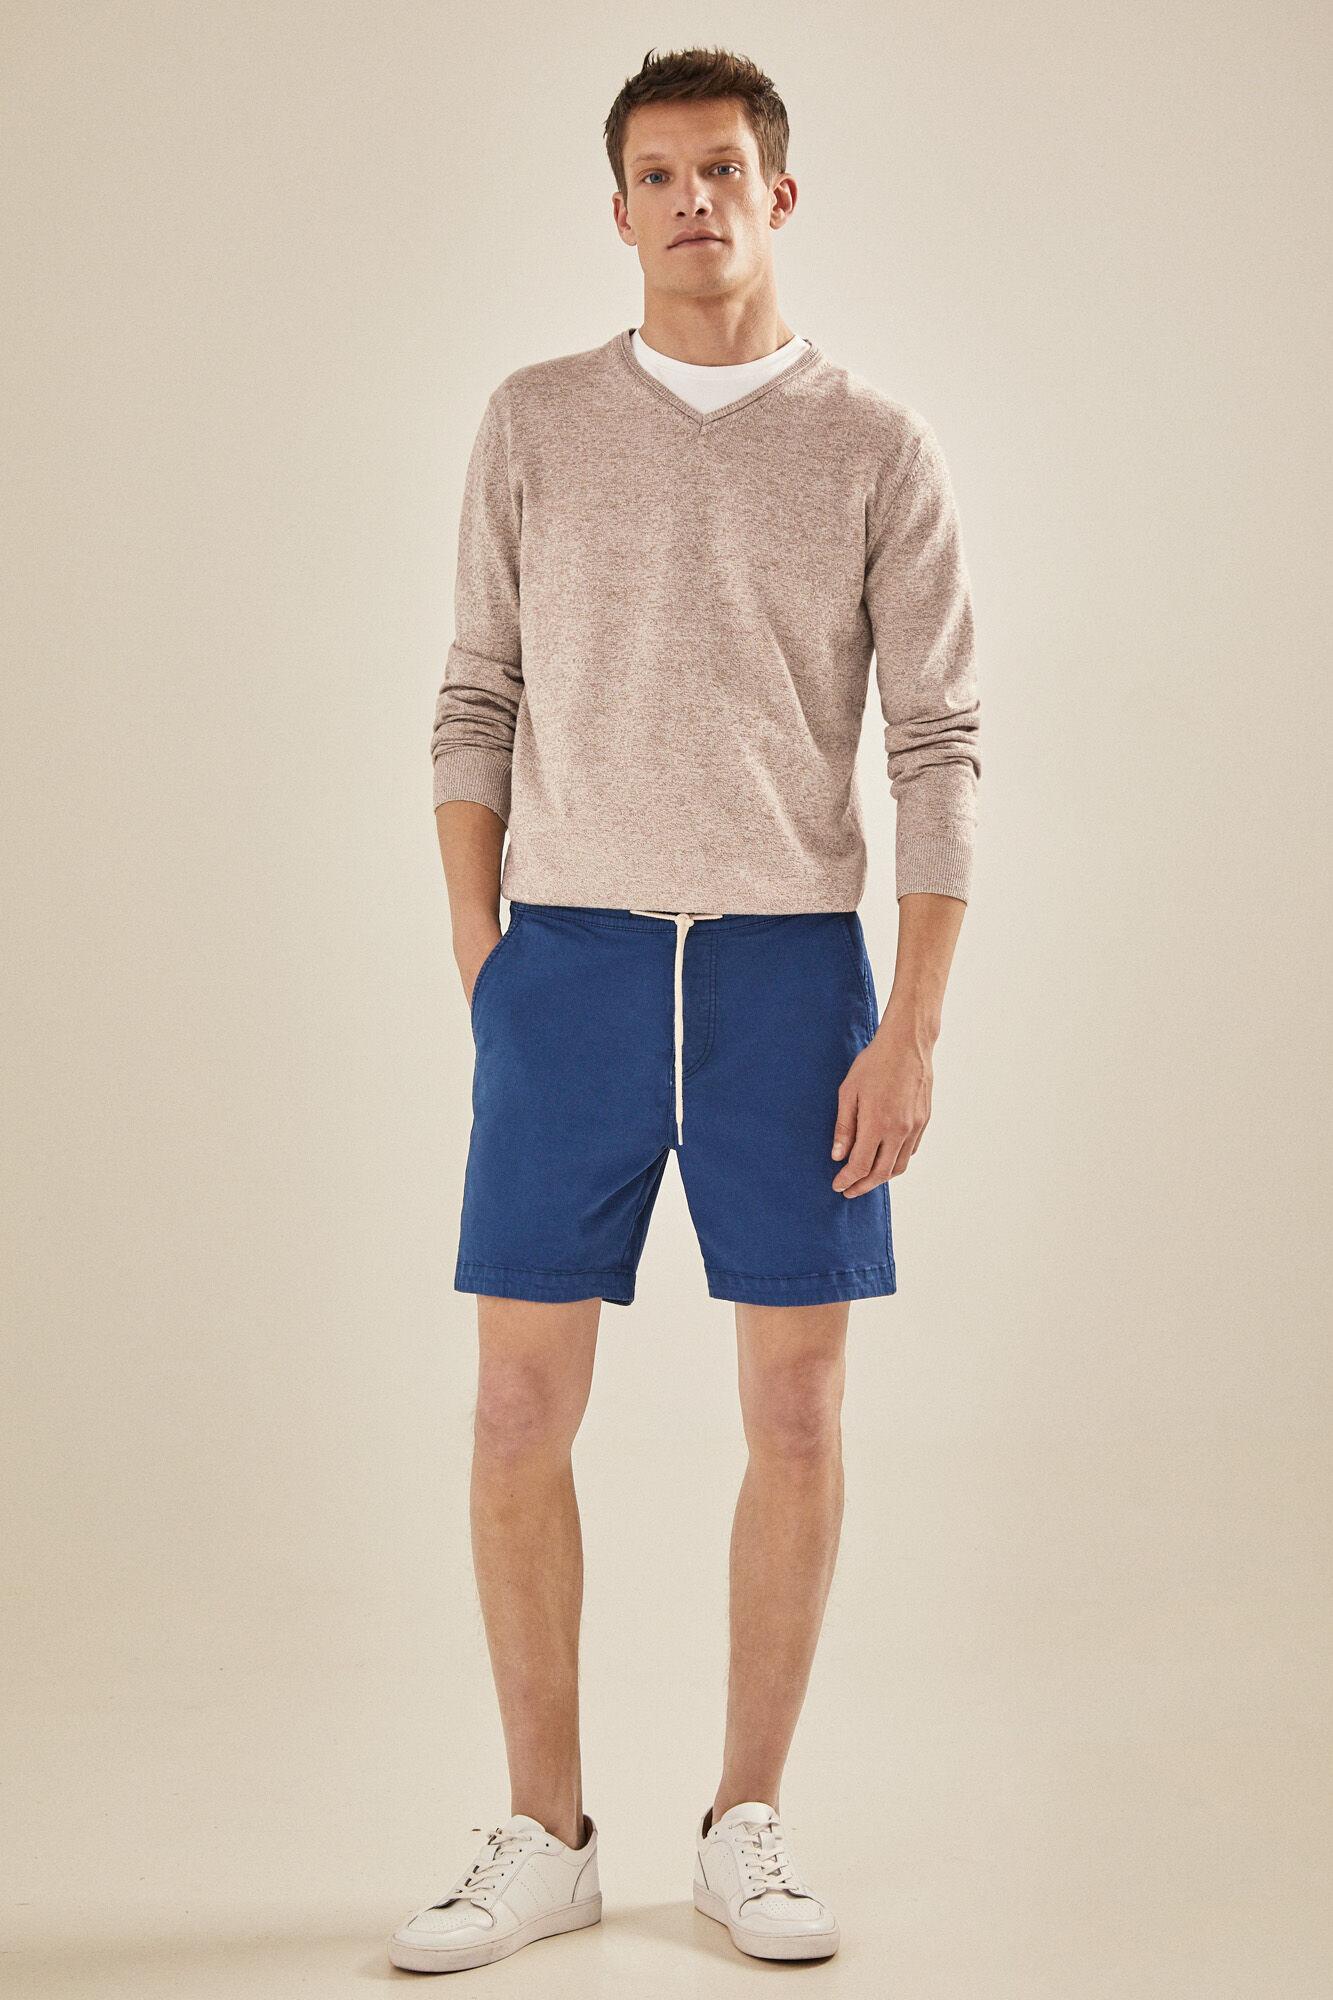 f43f6f676b Bermuda shorts with cord